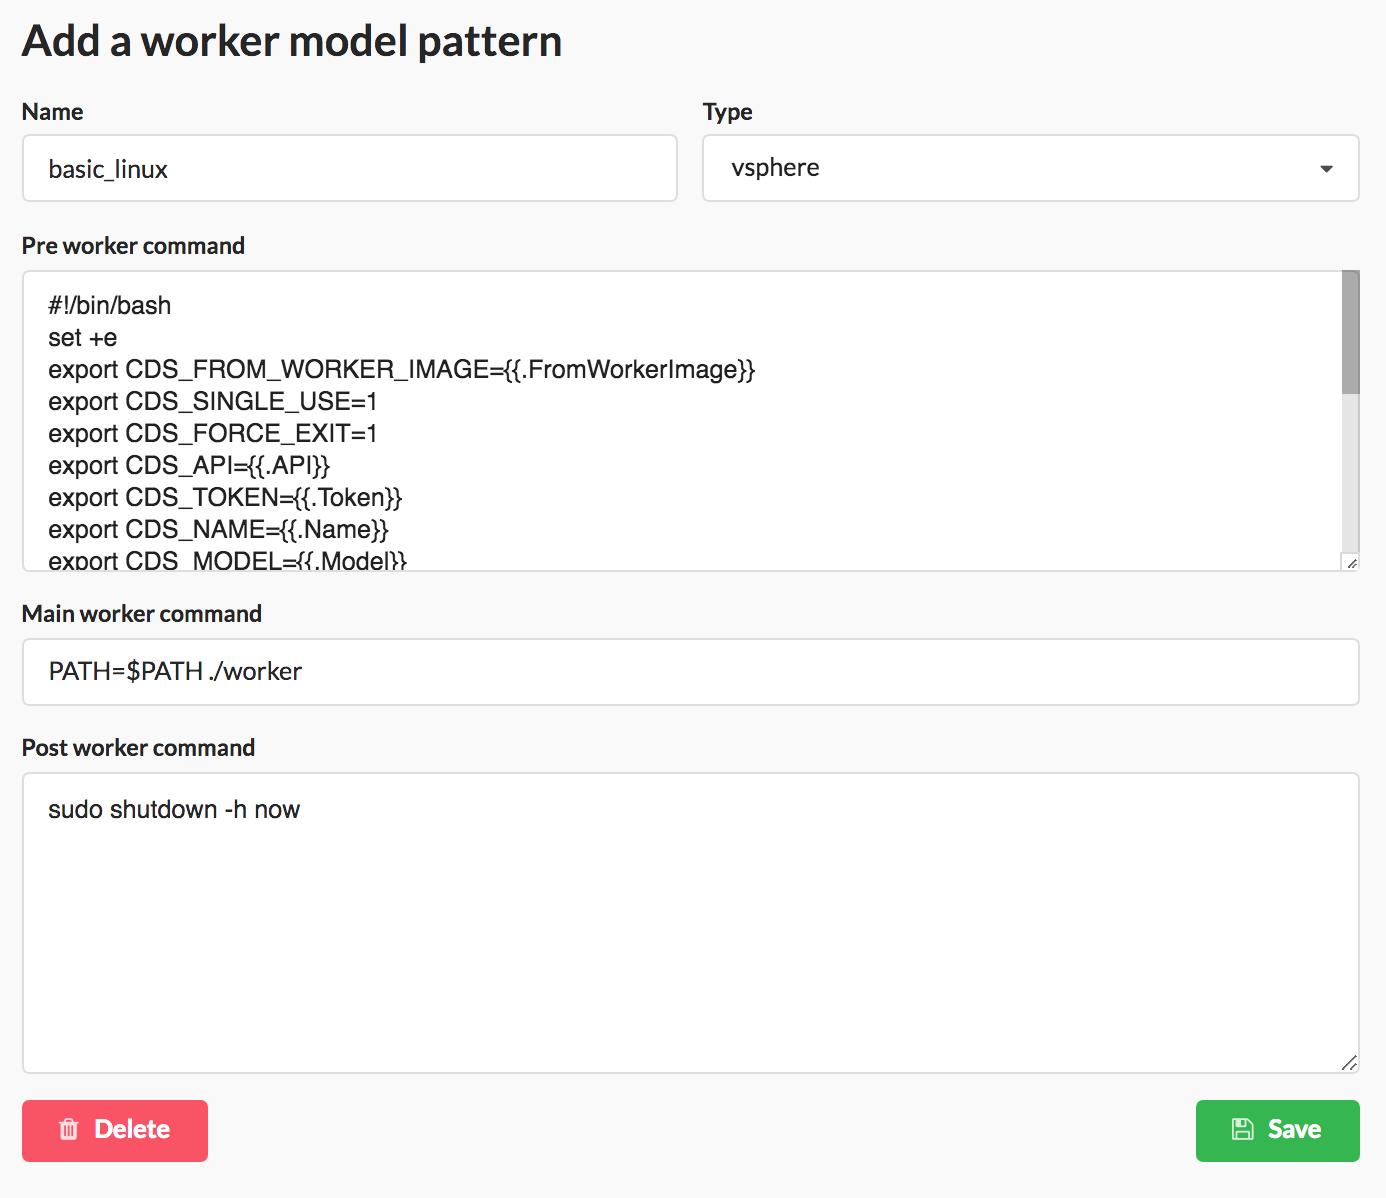 Worker Model Patterns menu